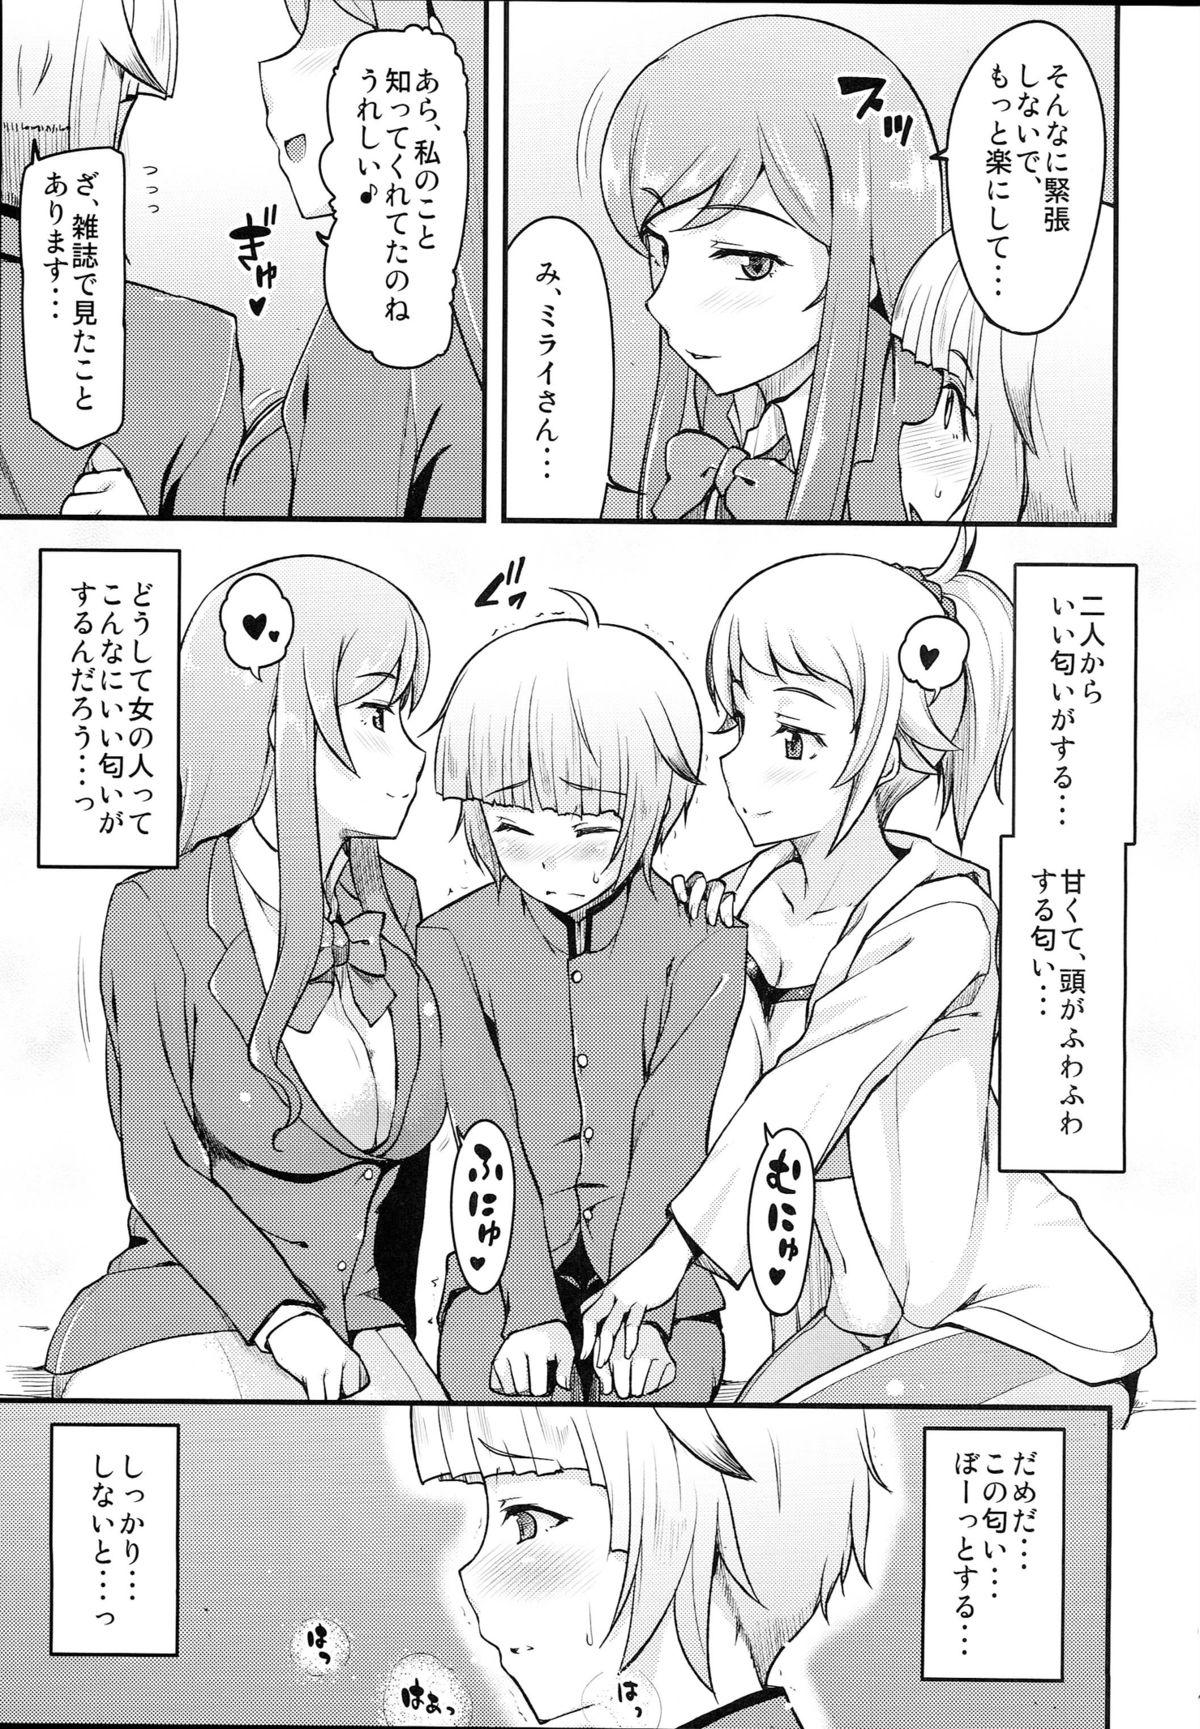 (C87) [from SCRATCH (Johnny) Amatoro Fighters Fumina senpai to Mirai oneechan no baai  (Gundam Build Fighters Try) 7